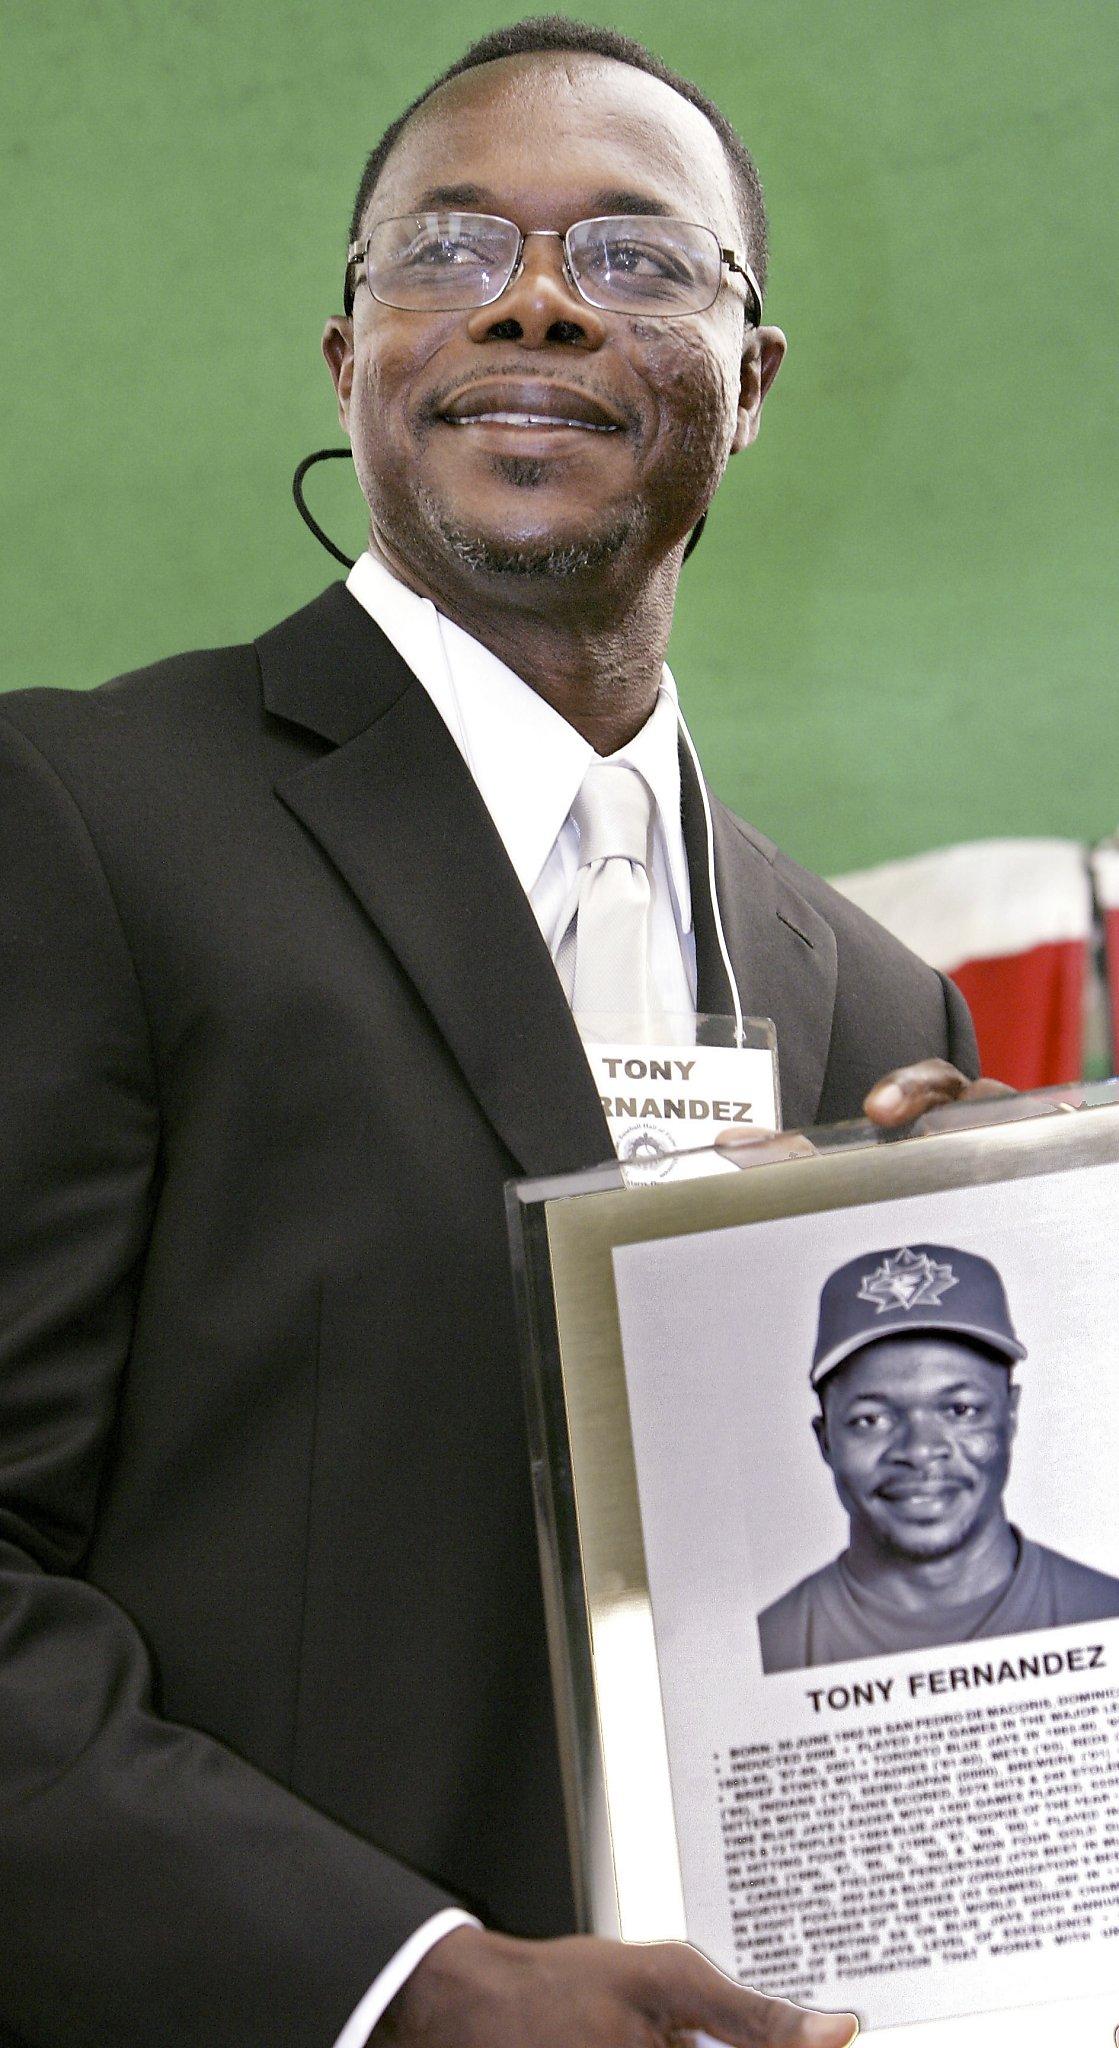 Stylish shortstop was leader of champion Jays